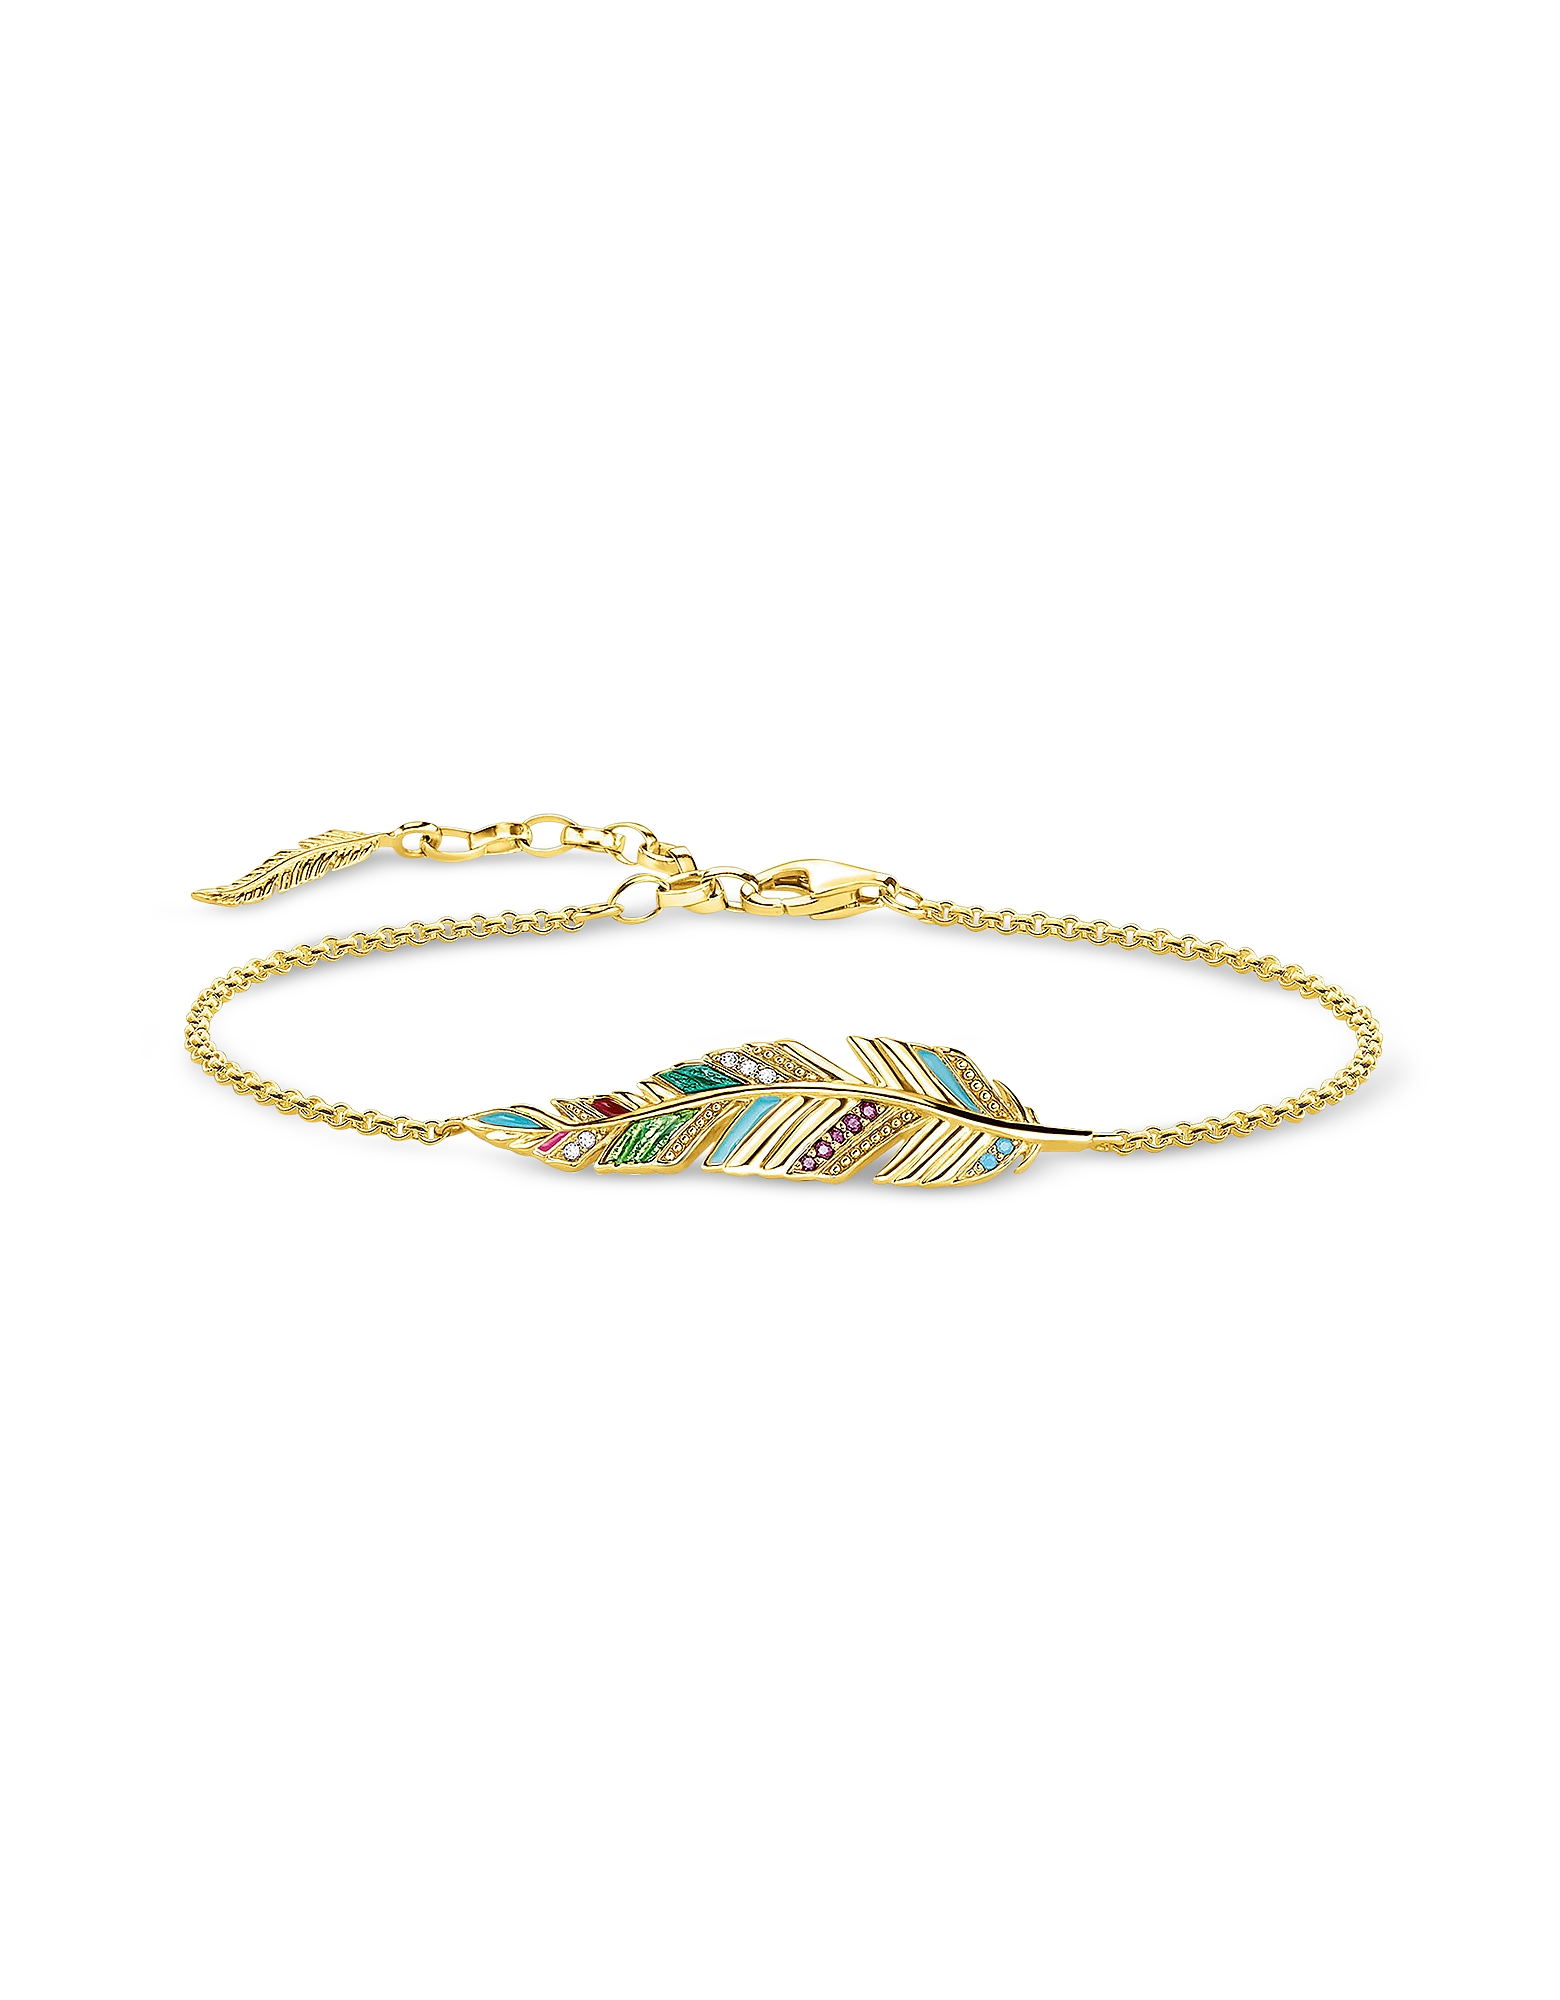 Thomas Sabo Bracelets, Gold Plated Sterling Silver, Enamel and Glass-ceramic Stones Feather Bracelet